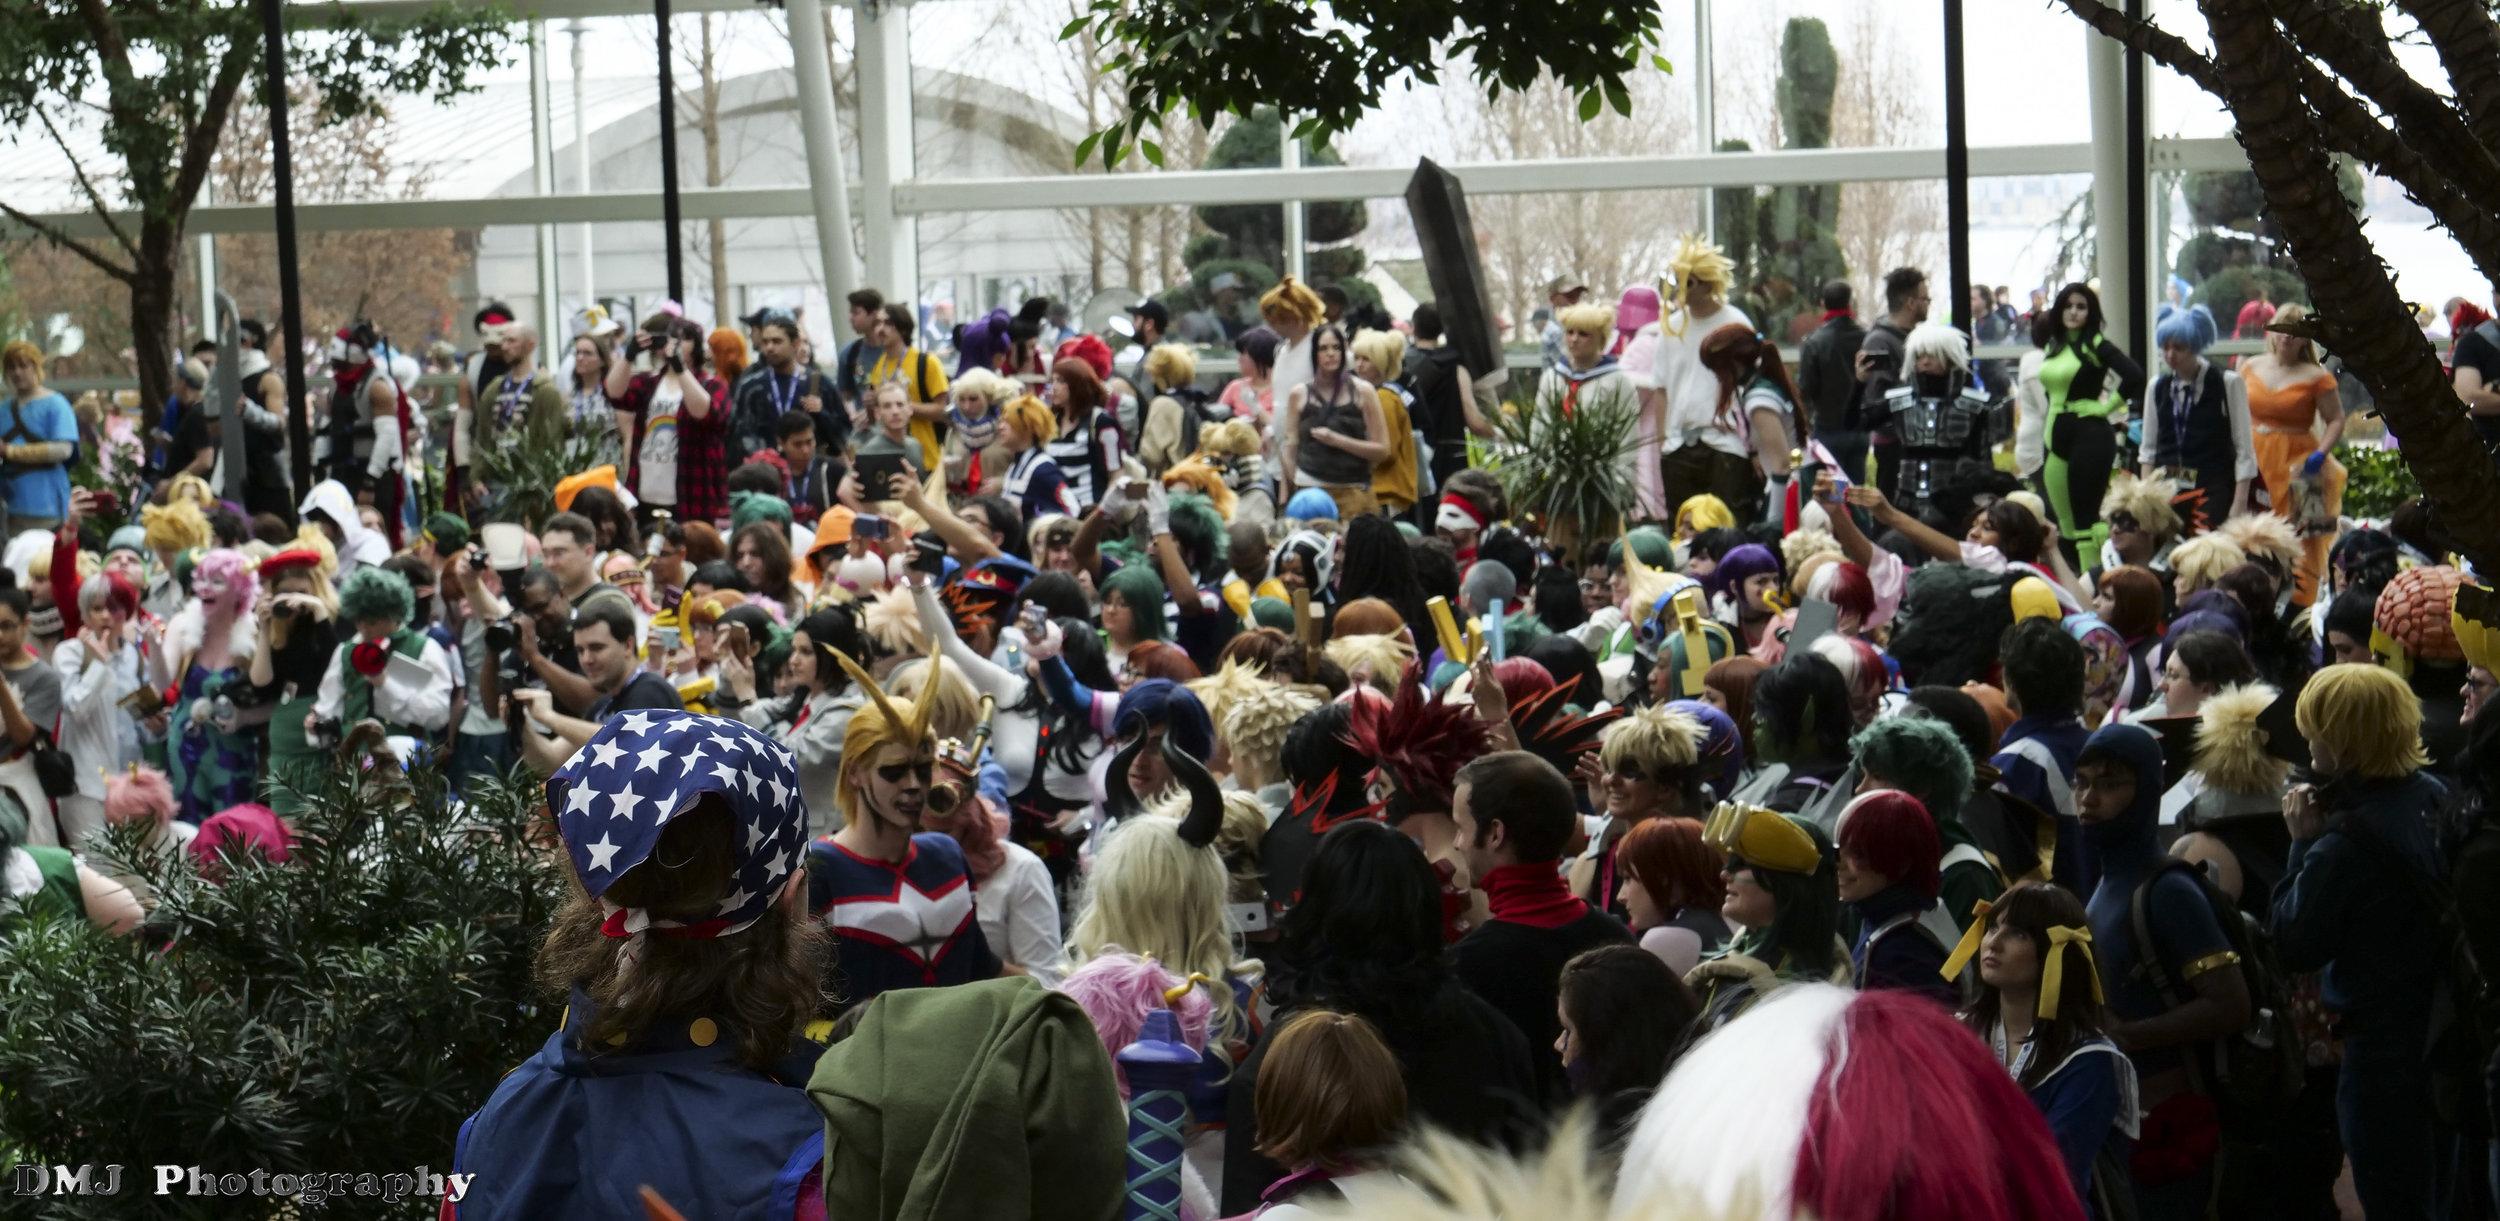 Crowded cosplay photoshoot for the My Hero Academia (Boku no Hero Academia) fandom